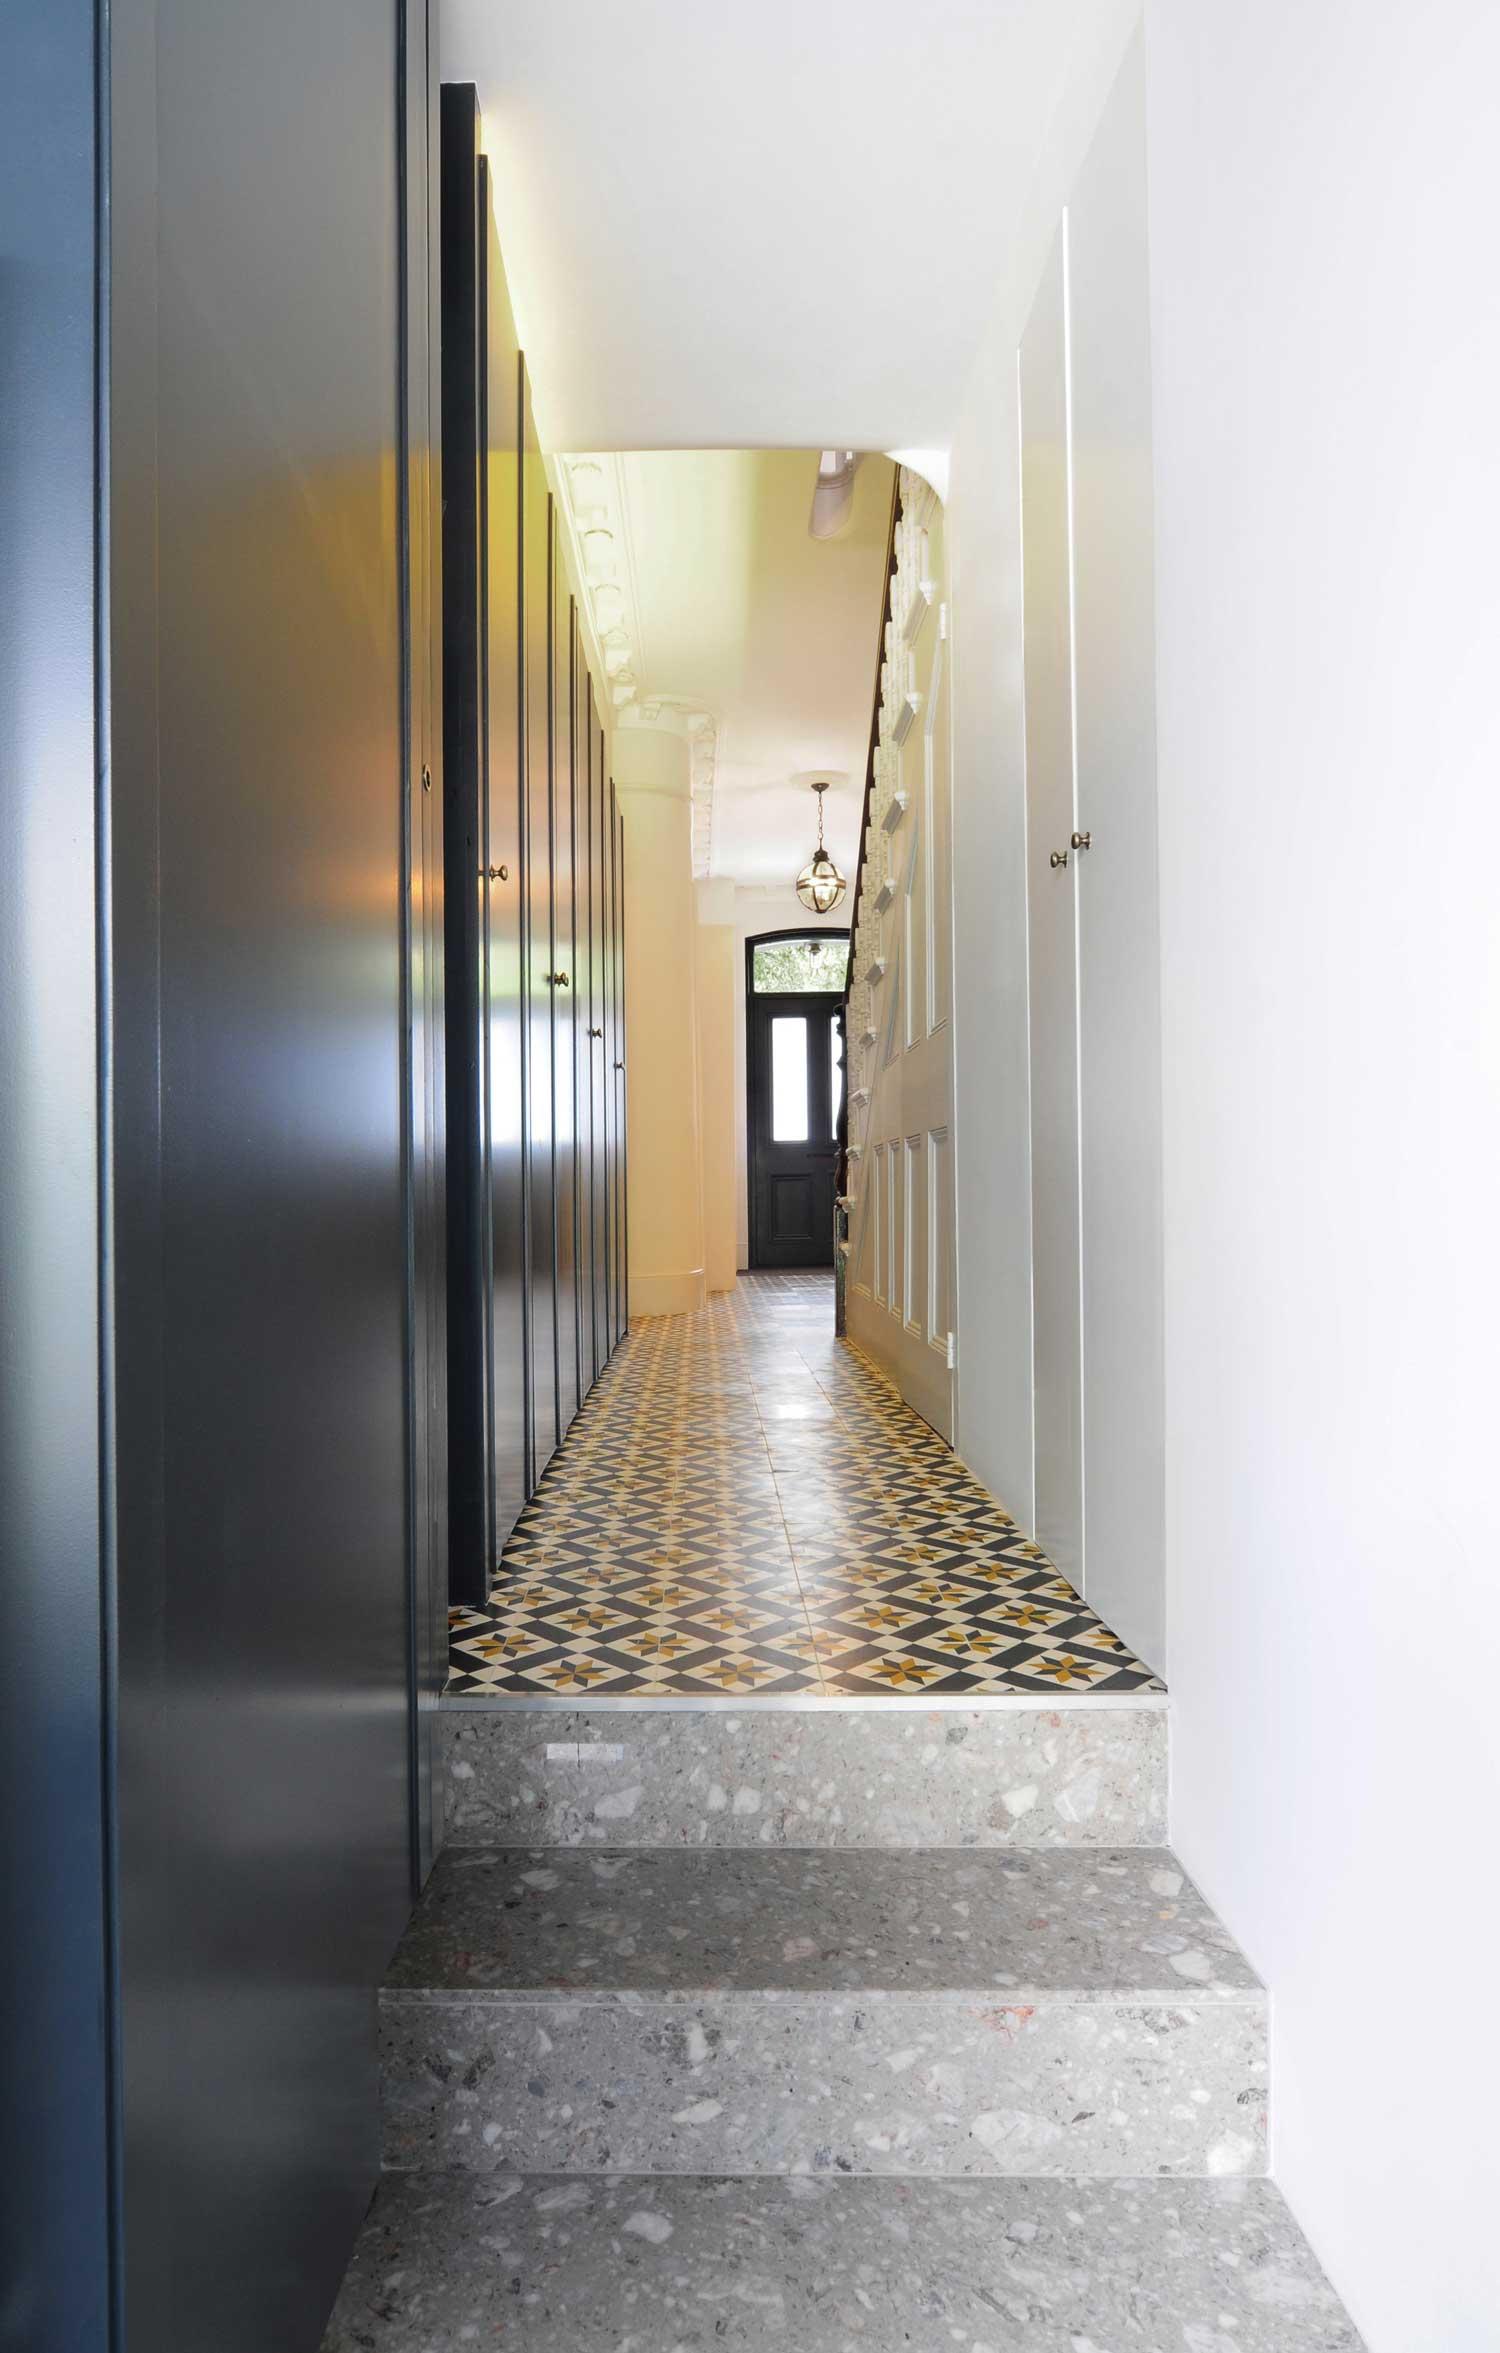 Bureau De Change S Residential Extension In North London